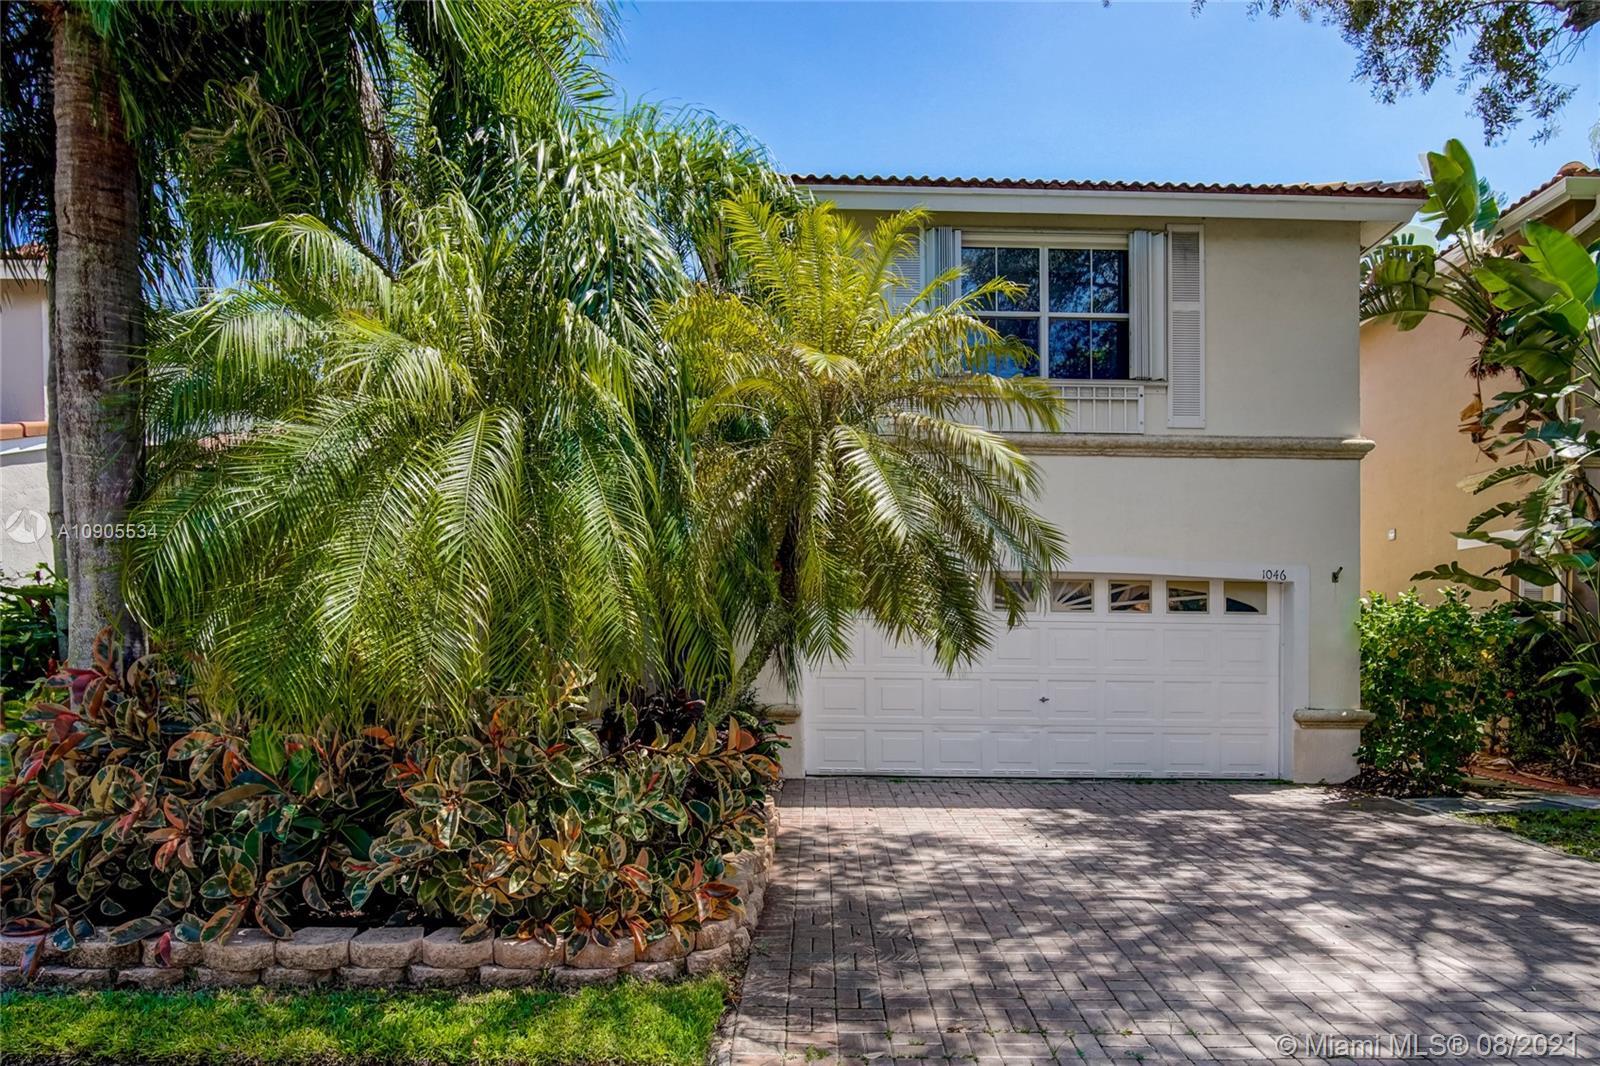 1046 Satinleaf St, Hollywood FL 33019